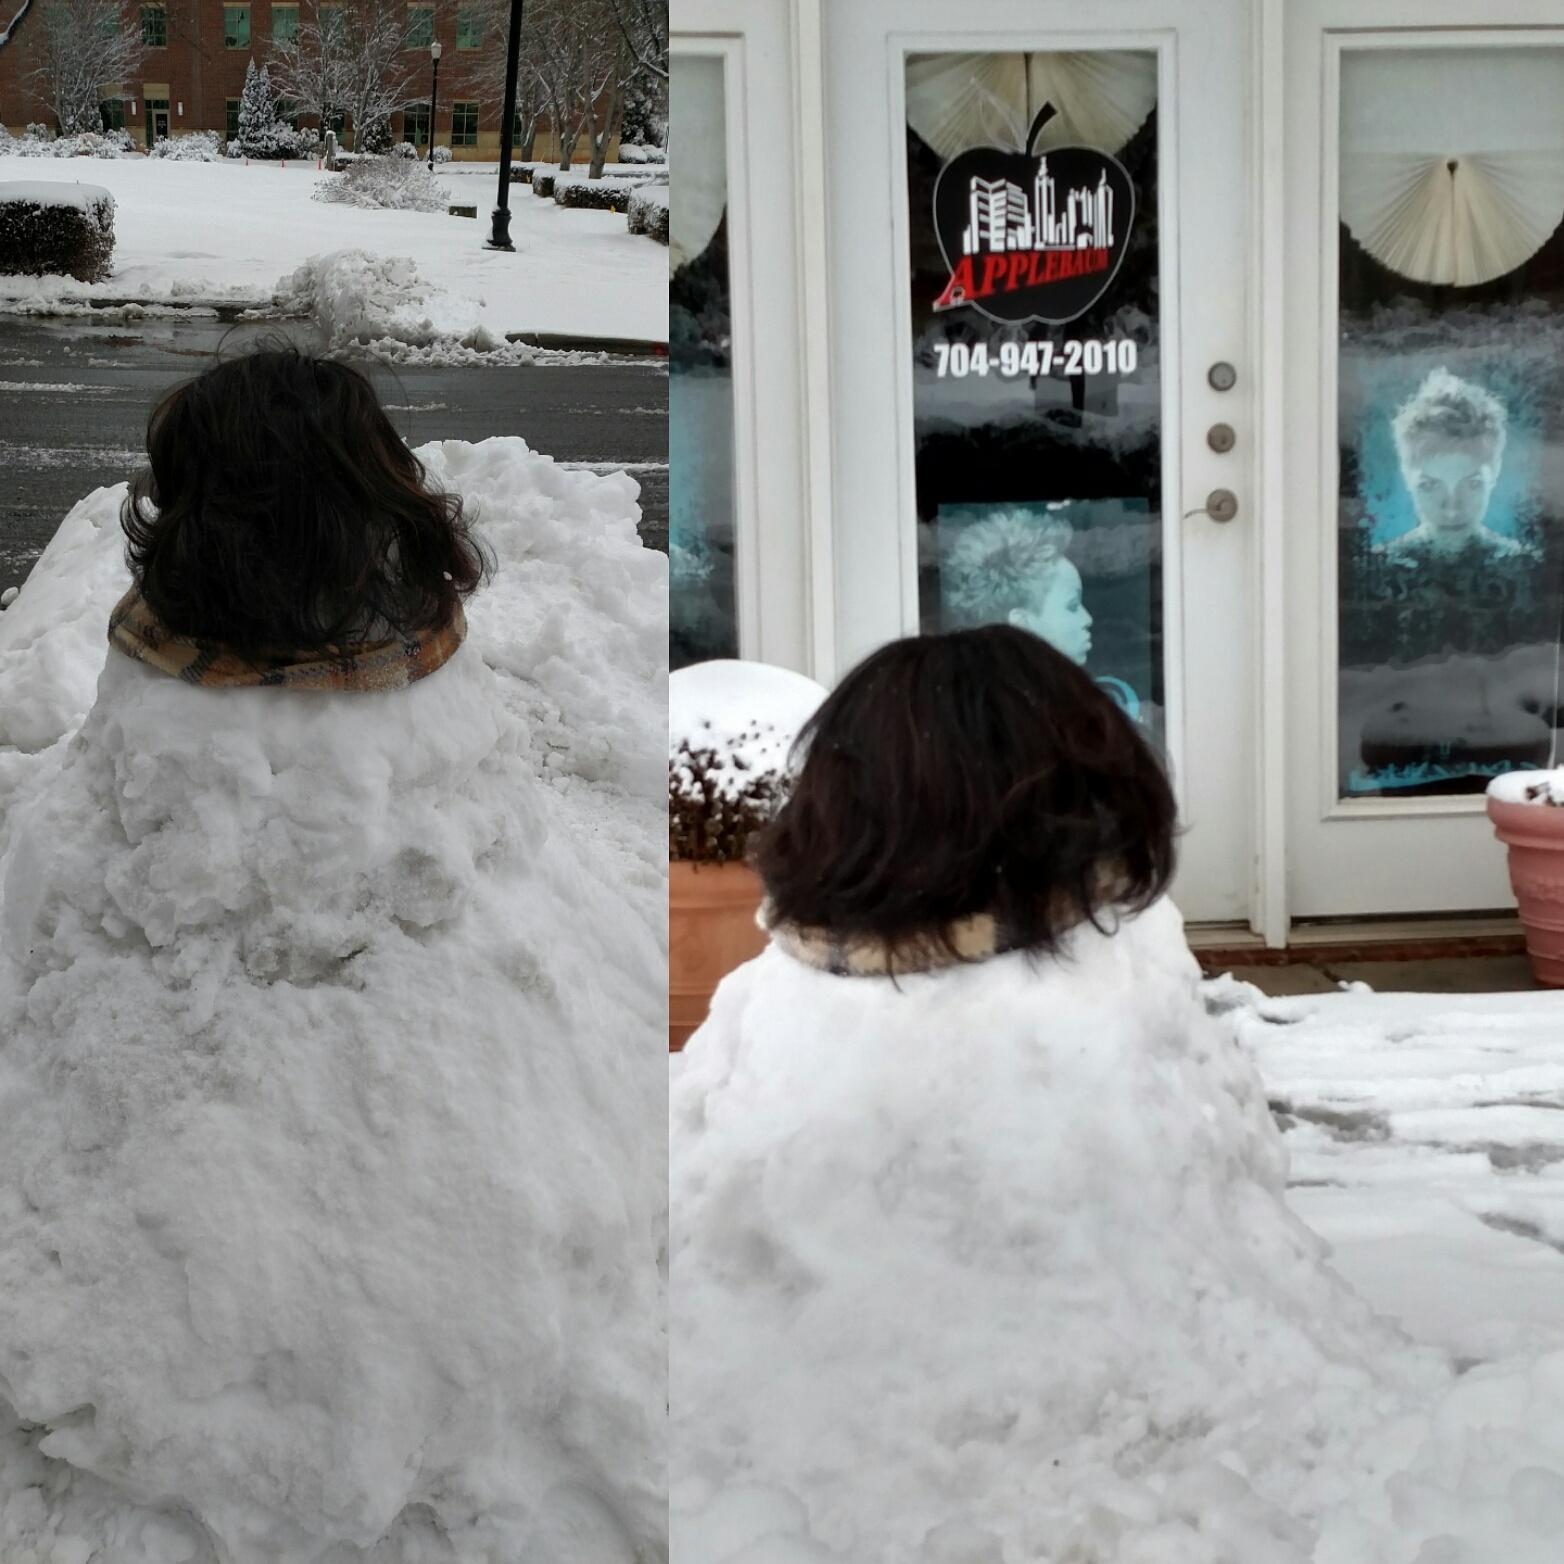 Phenomenalhaircare faux client january snow 2018 nvjuhfo Images